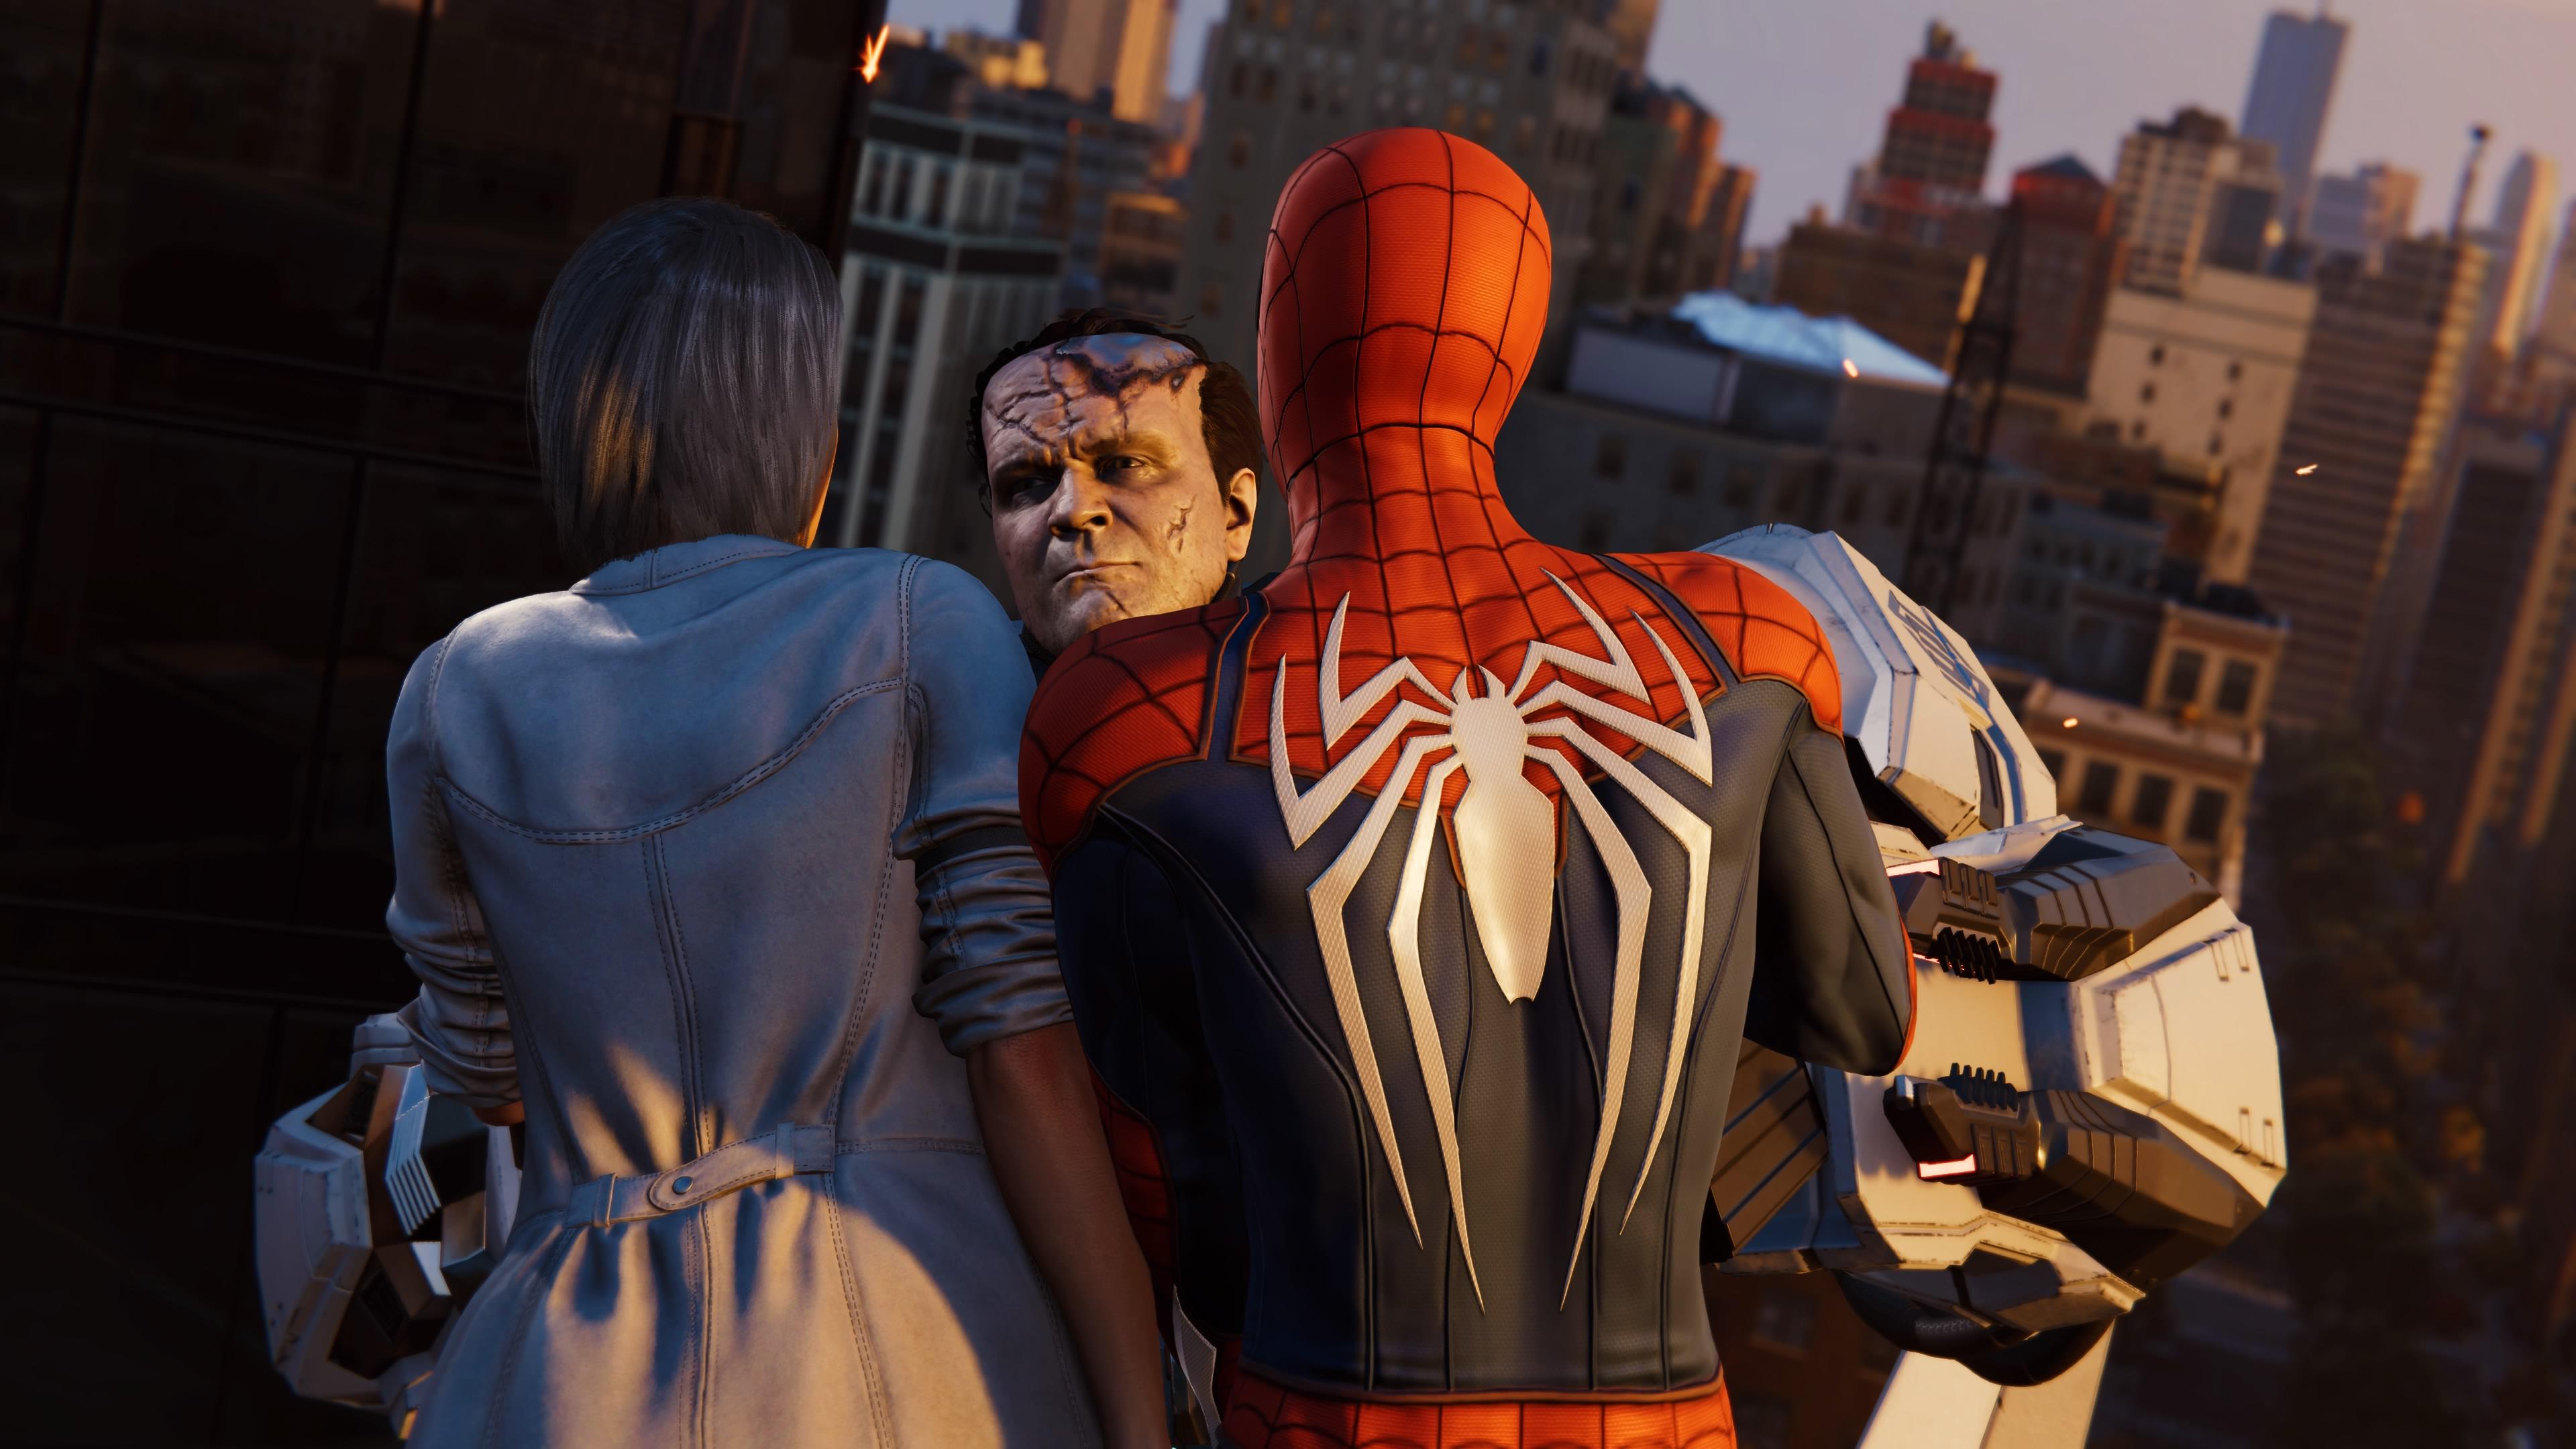 Joseph Martello (Earth-1048) vs. Peter Parker (Earth-1048) and Silver Sablinova (Earth-1048) from Marvel's Spider-Man (video game) 001.jpg